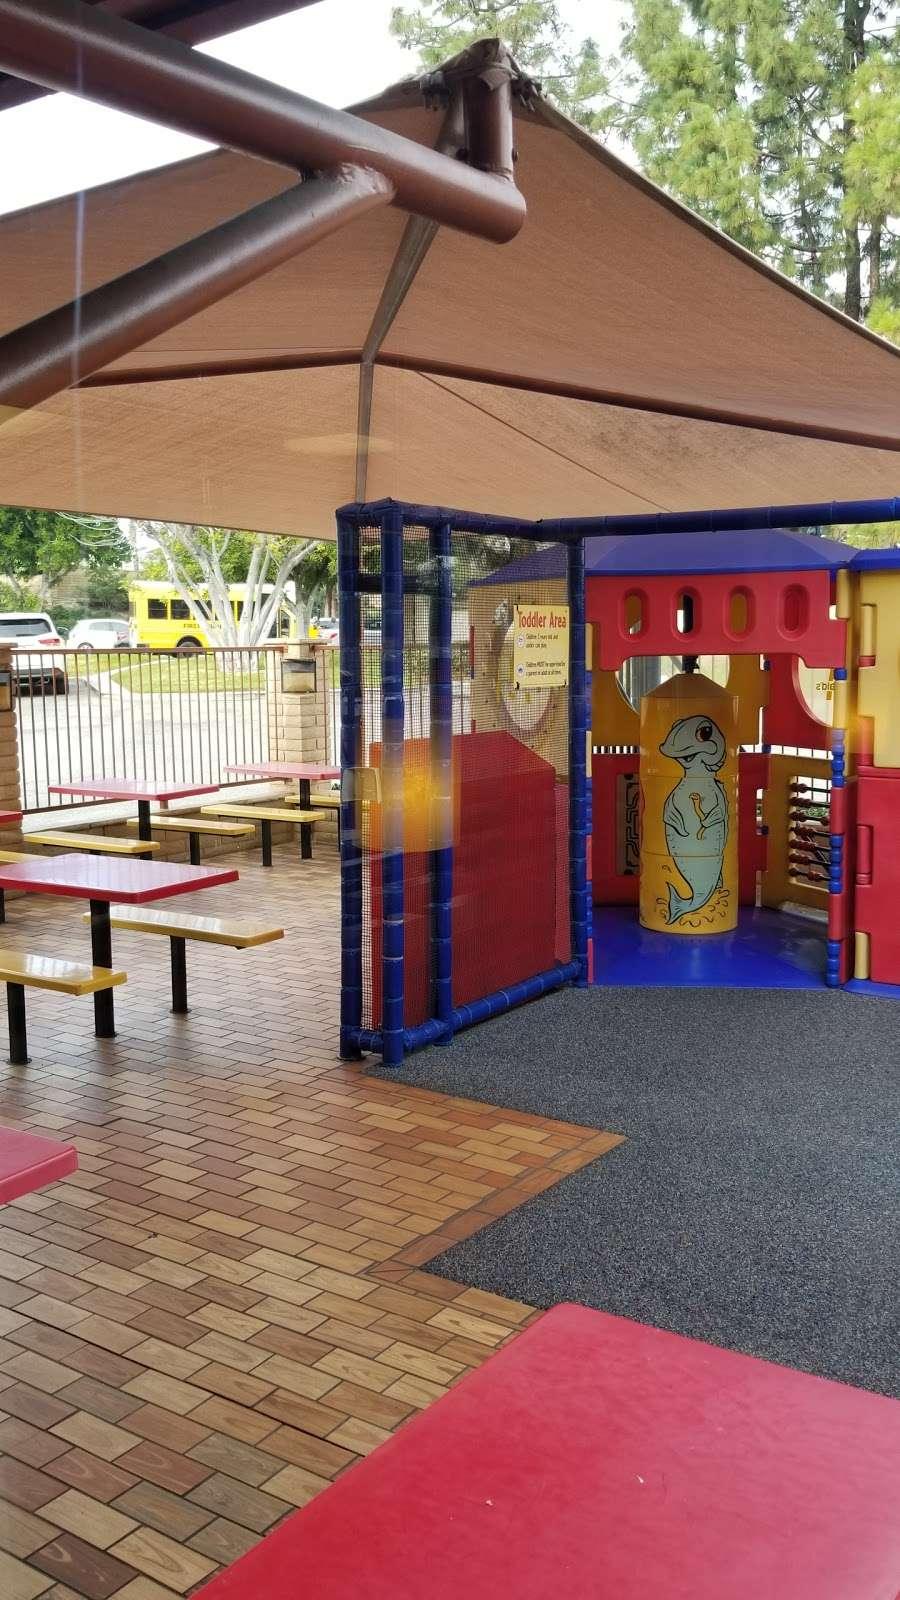 McDonalds - cafe  | Photo 2 of 10 | Address: 26902 Trabuco Rd, Mission Viejo, CA 92691, USA | Phone: (949) 855-0336